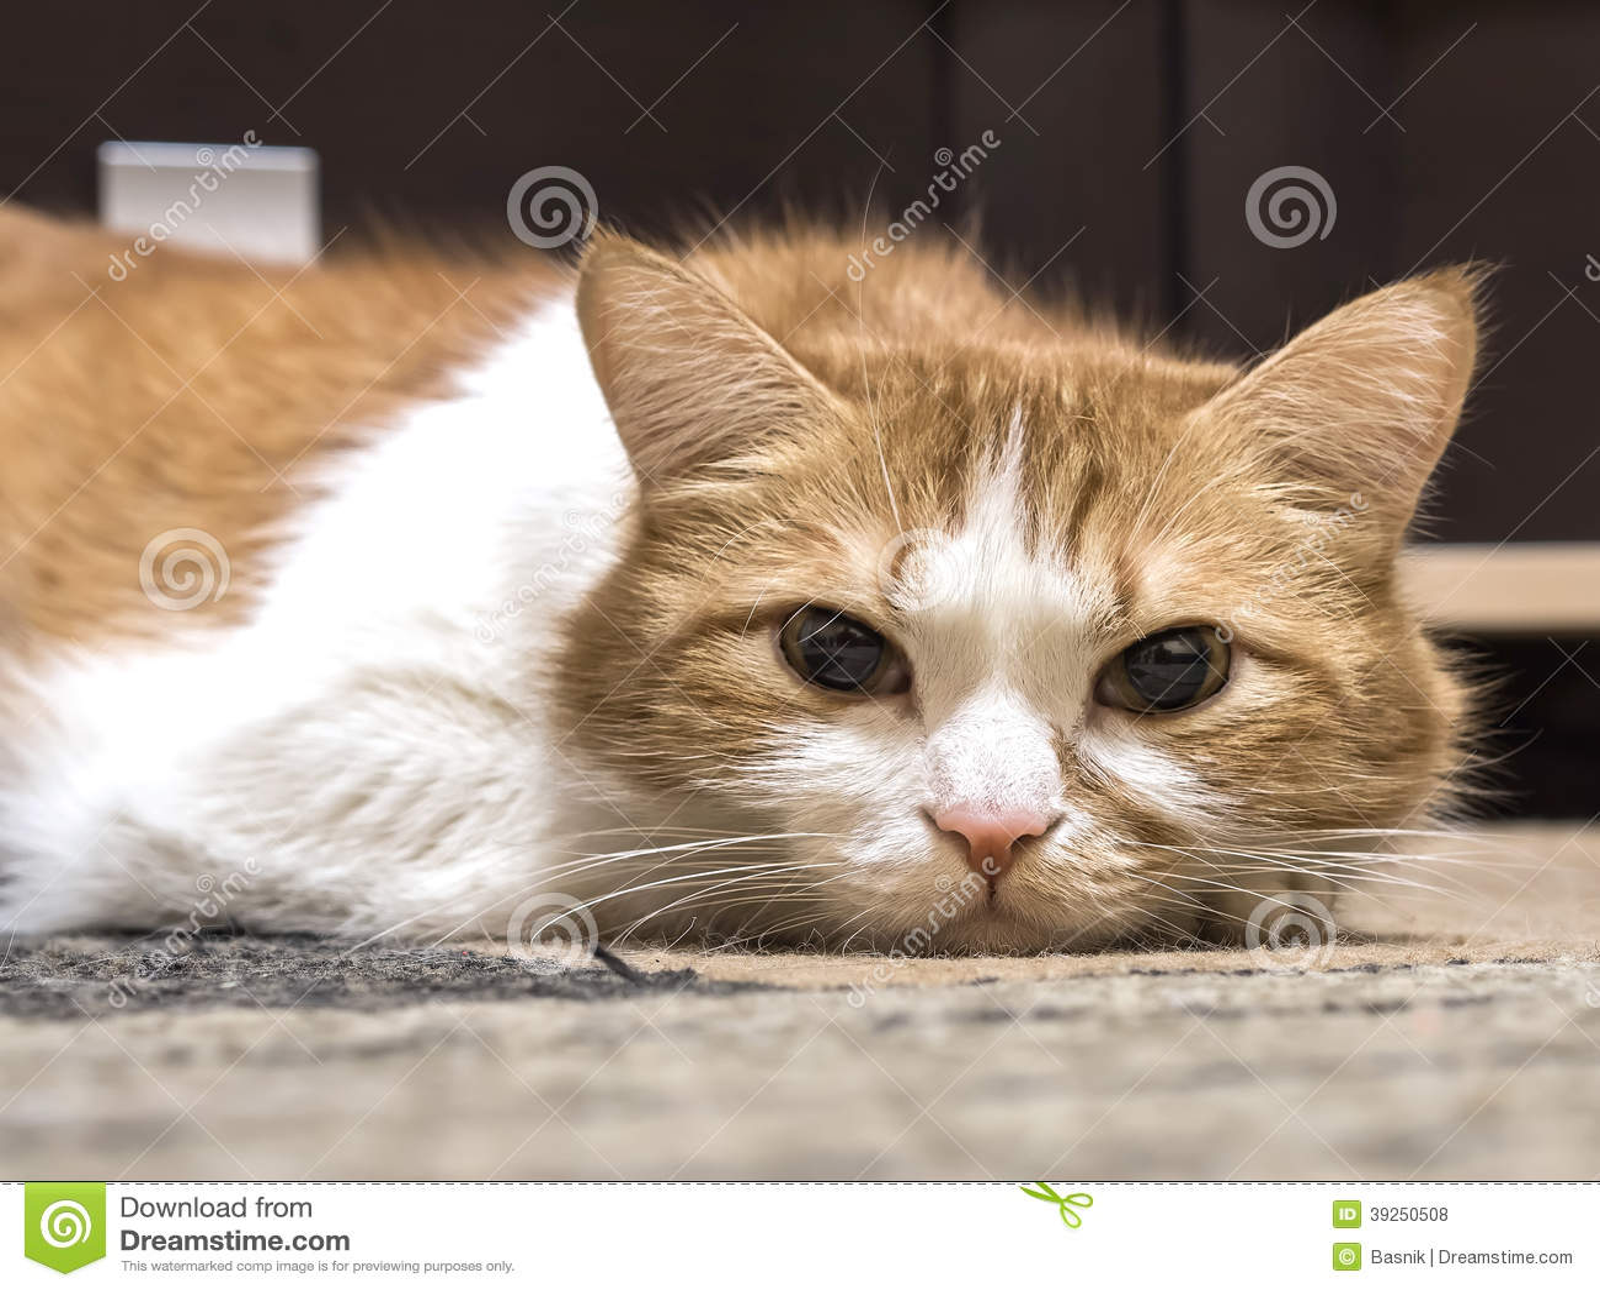 can u give a cat benadryl